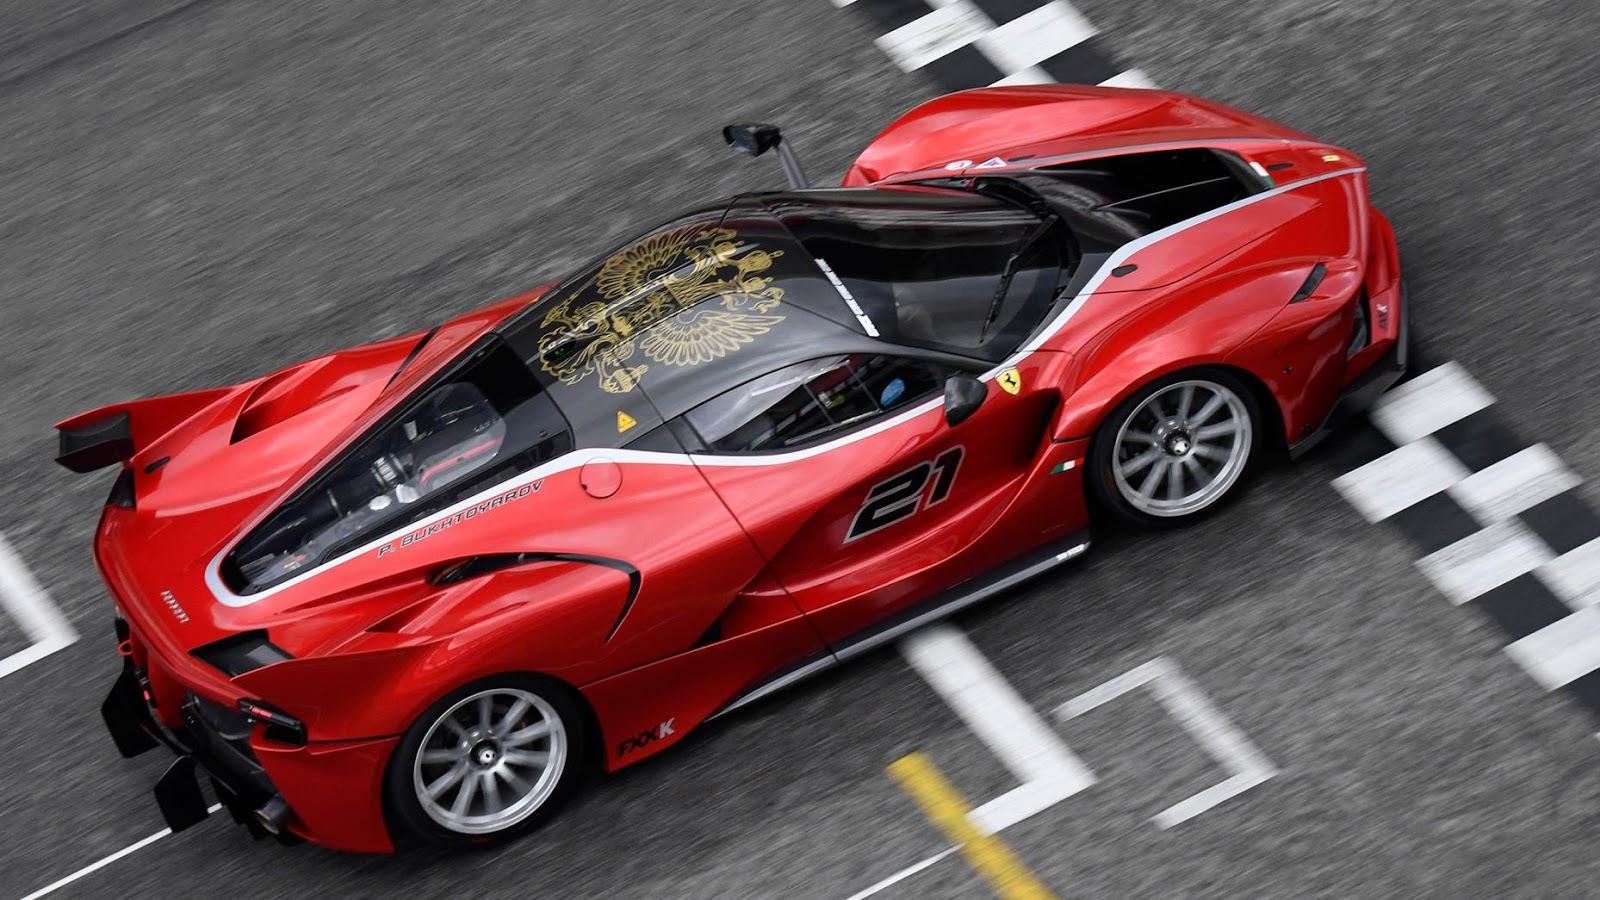 Ngắm Ferrari thả cửa tại ngày hội Ferrari Corse Clienti